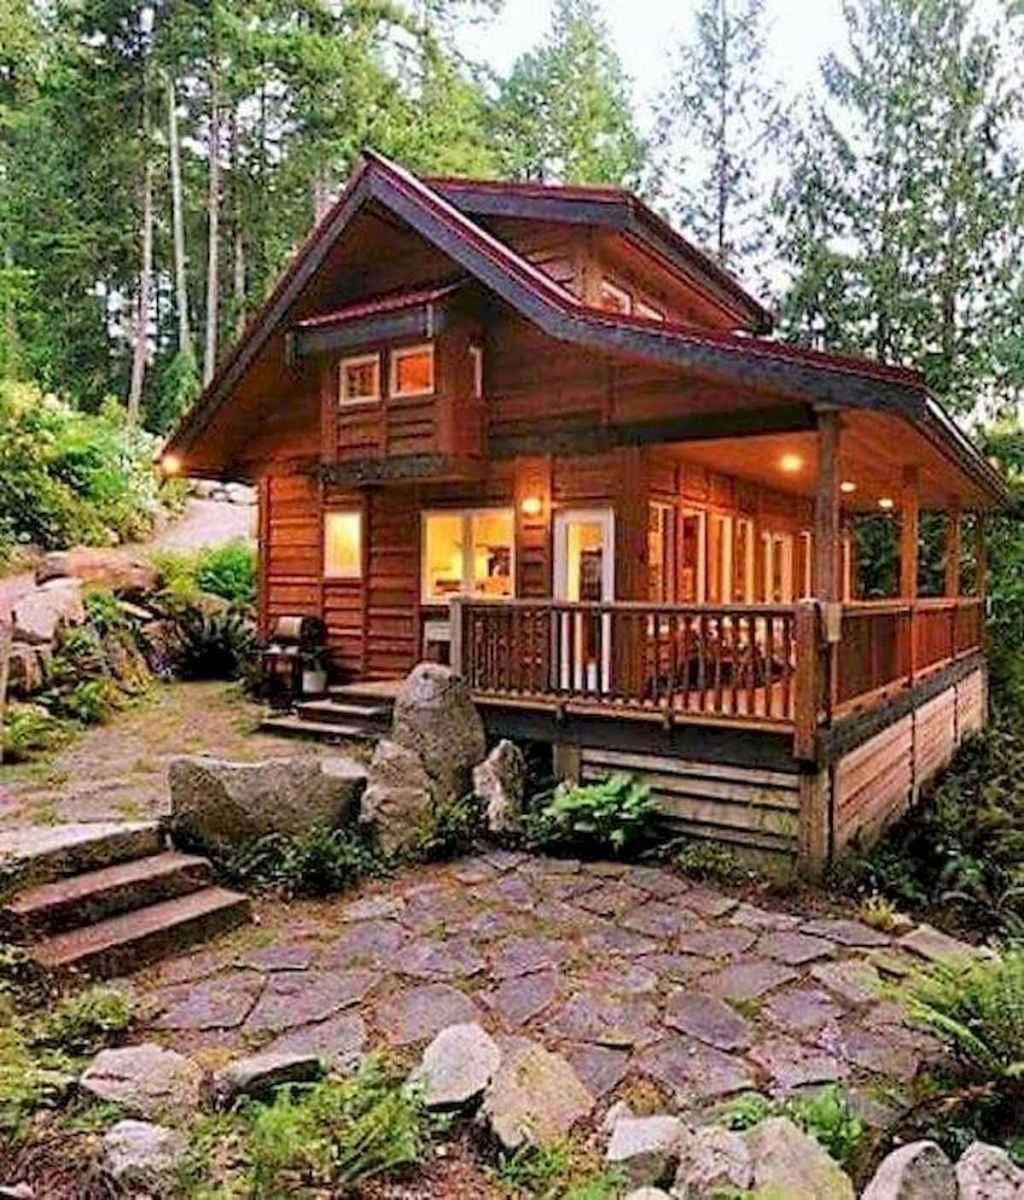 70 Suprising Small Log Cabin Homes Design Ideas (30)